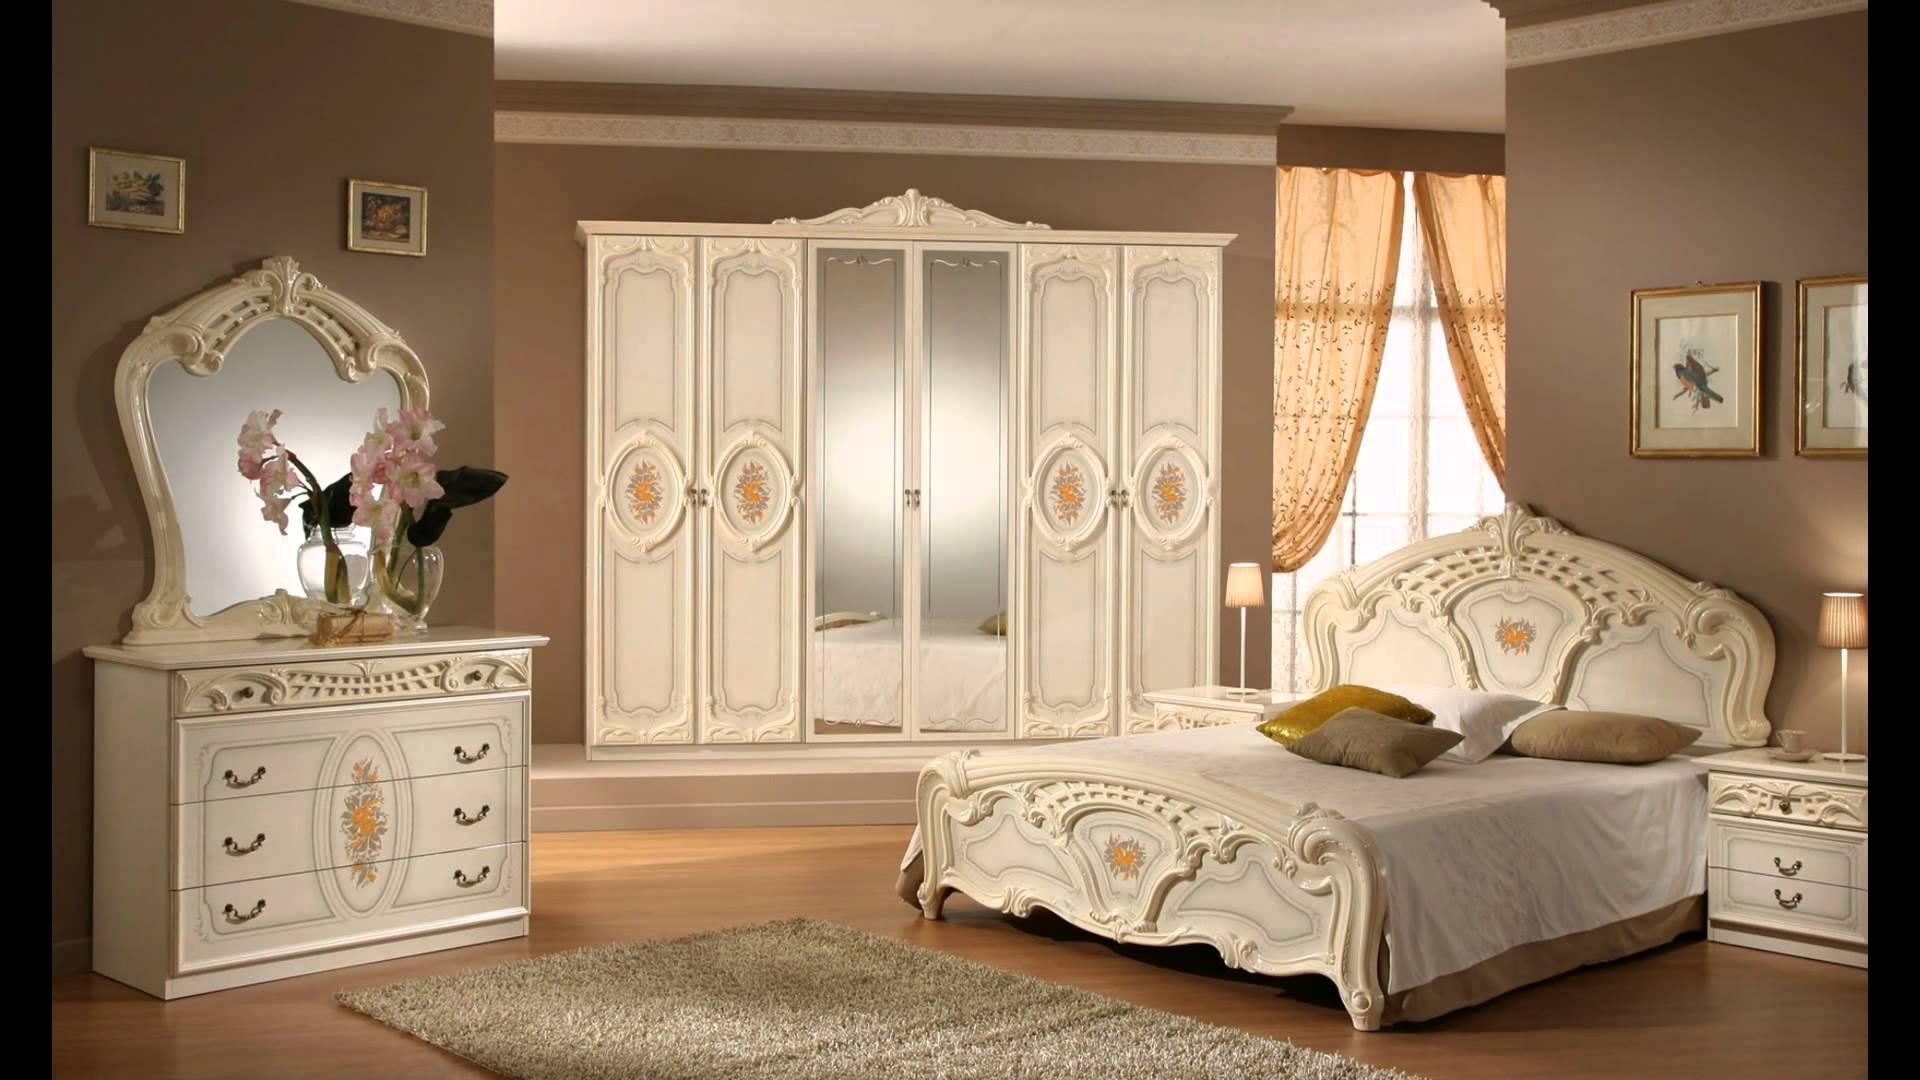 صور اثاث غرف نوم , كتالوج احدث تصاميم غرف نوم